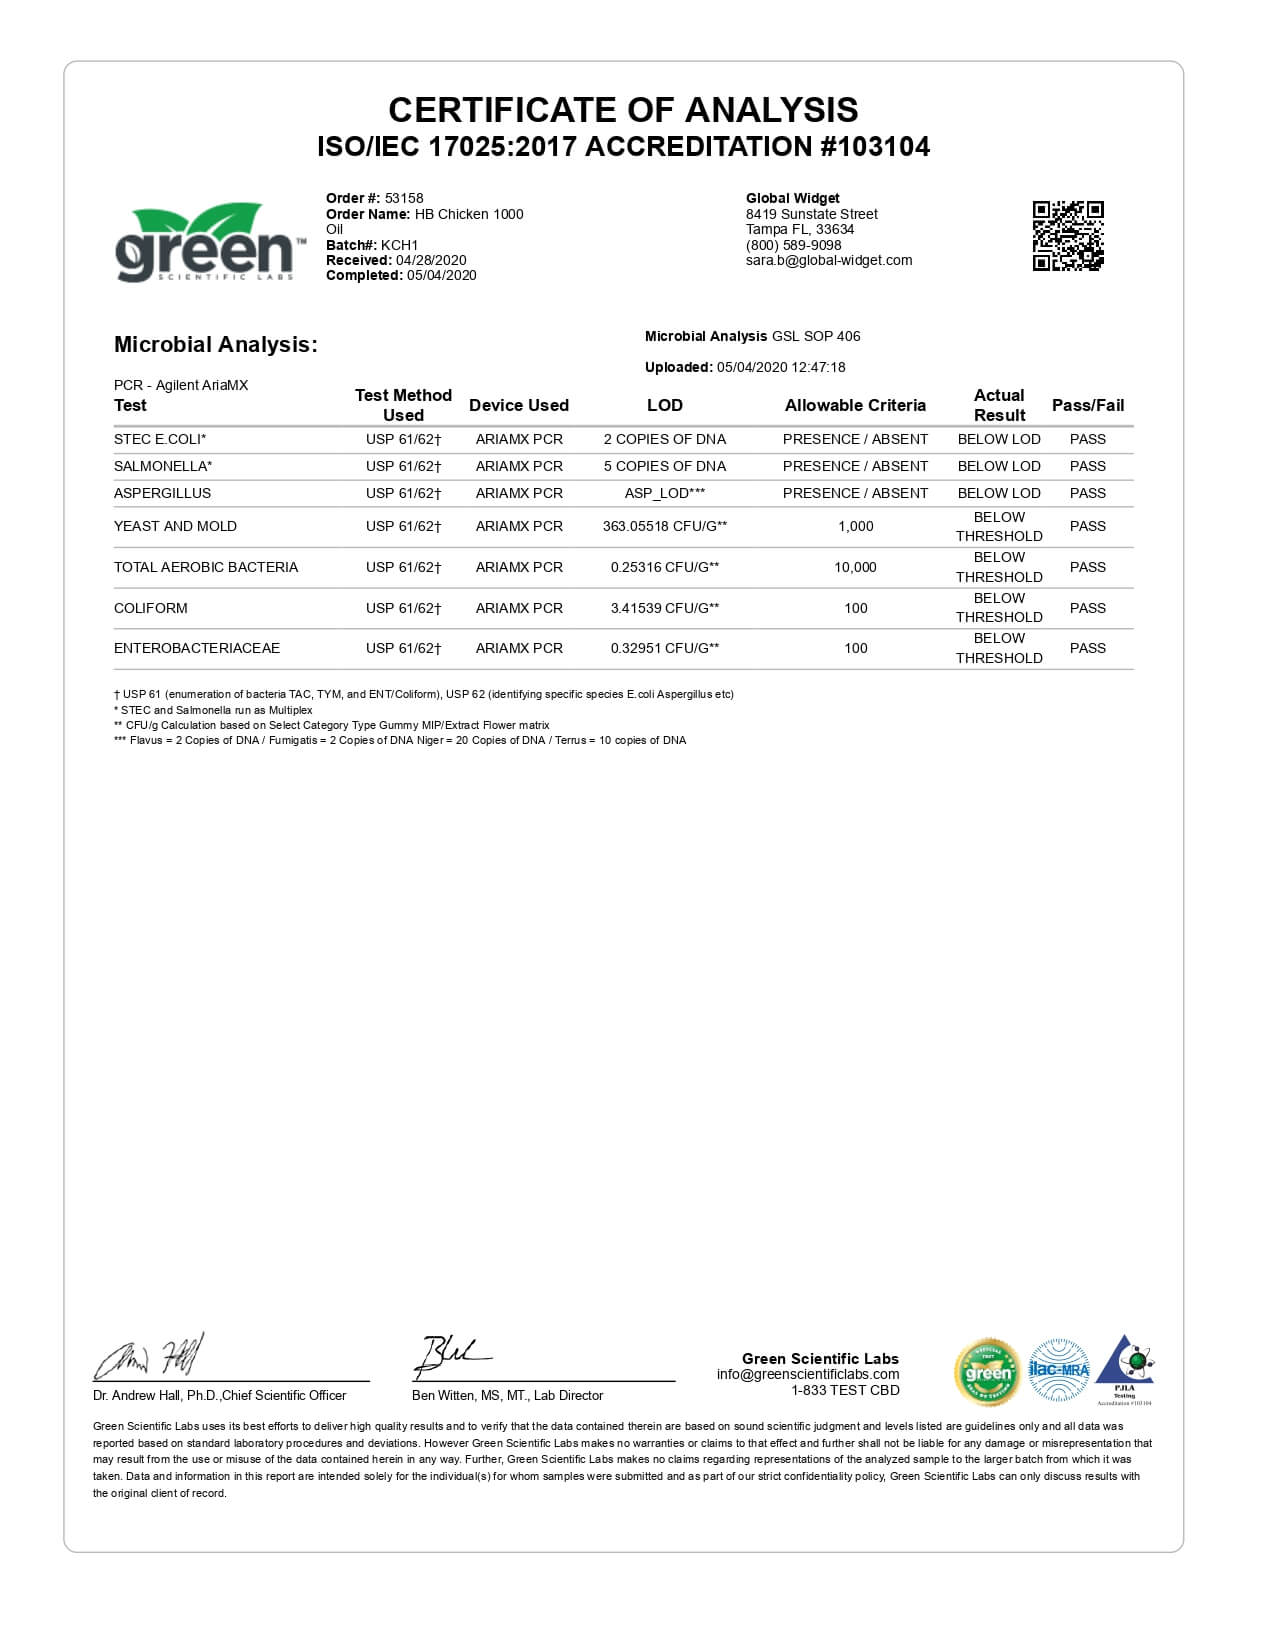 Hemp Bombs CBD Pet Tincture Chicken Flavor 1000mg Lab Report